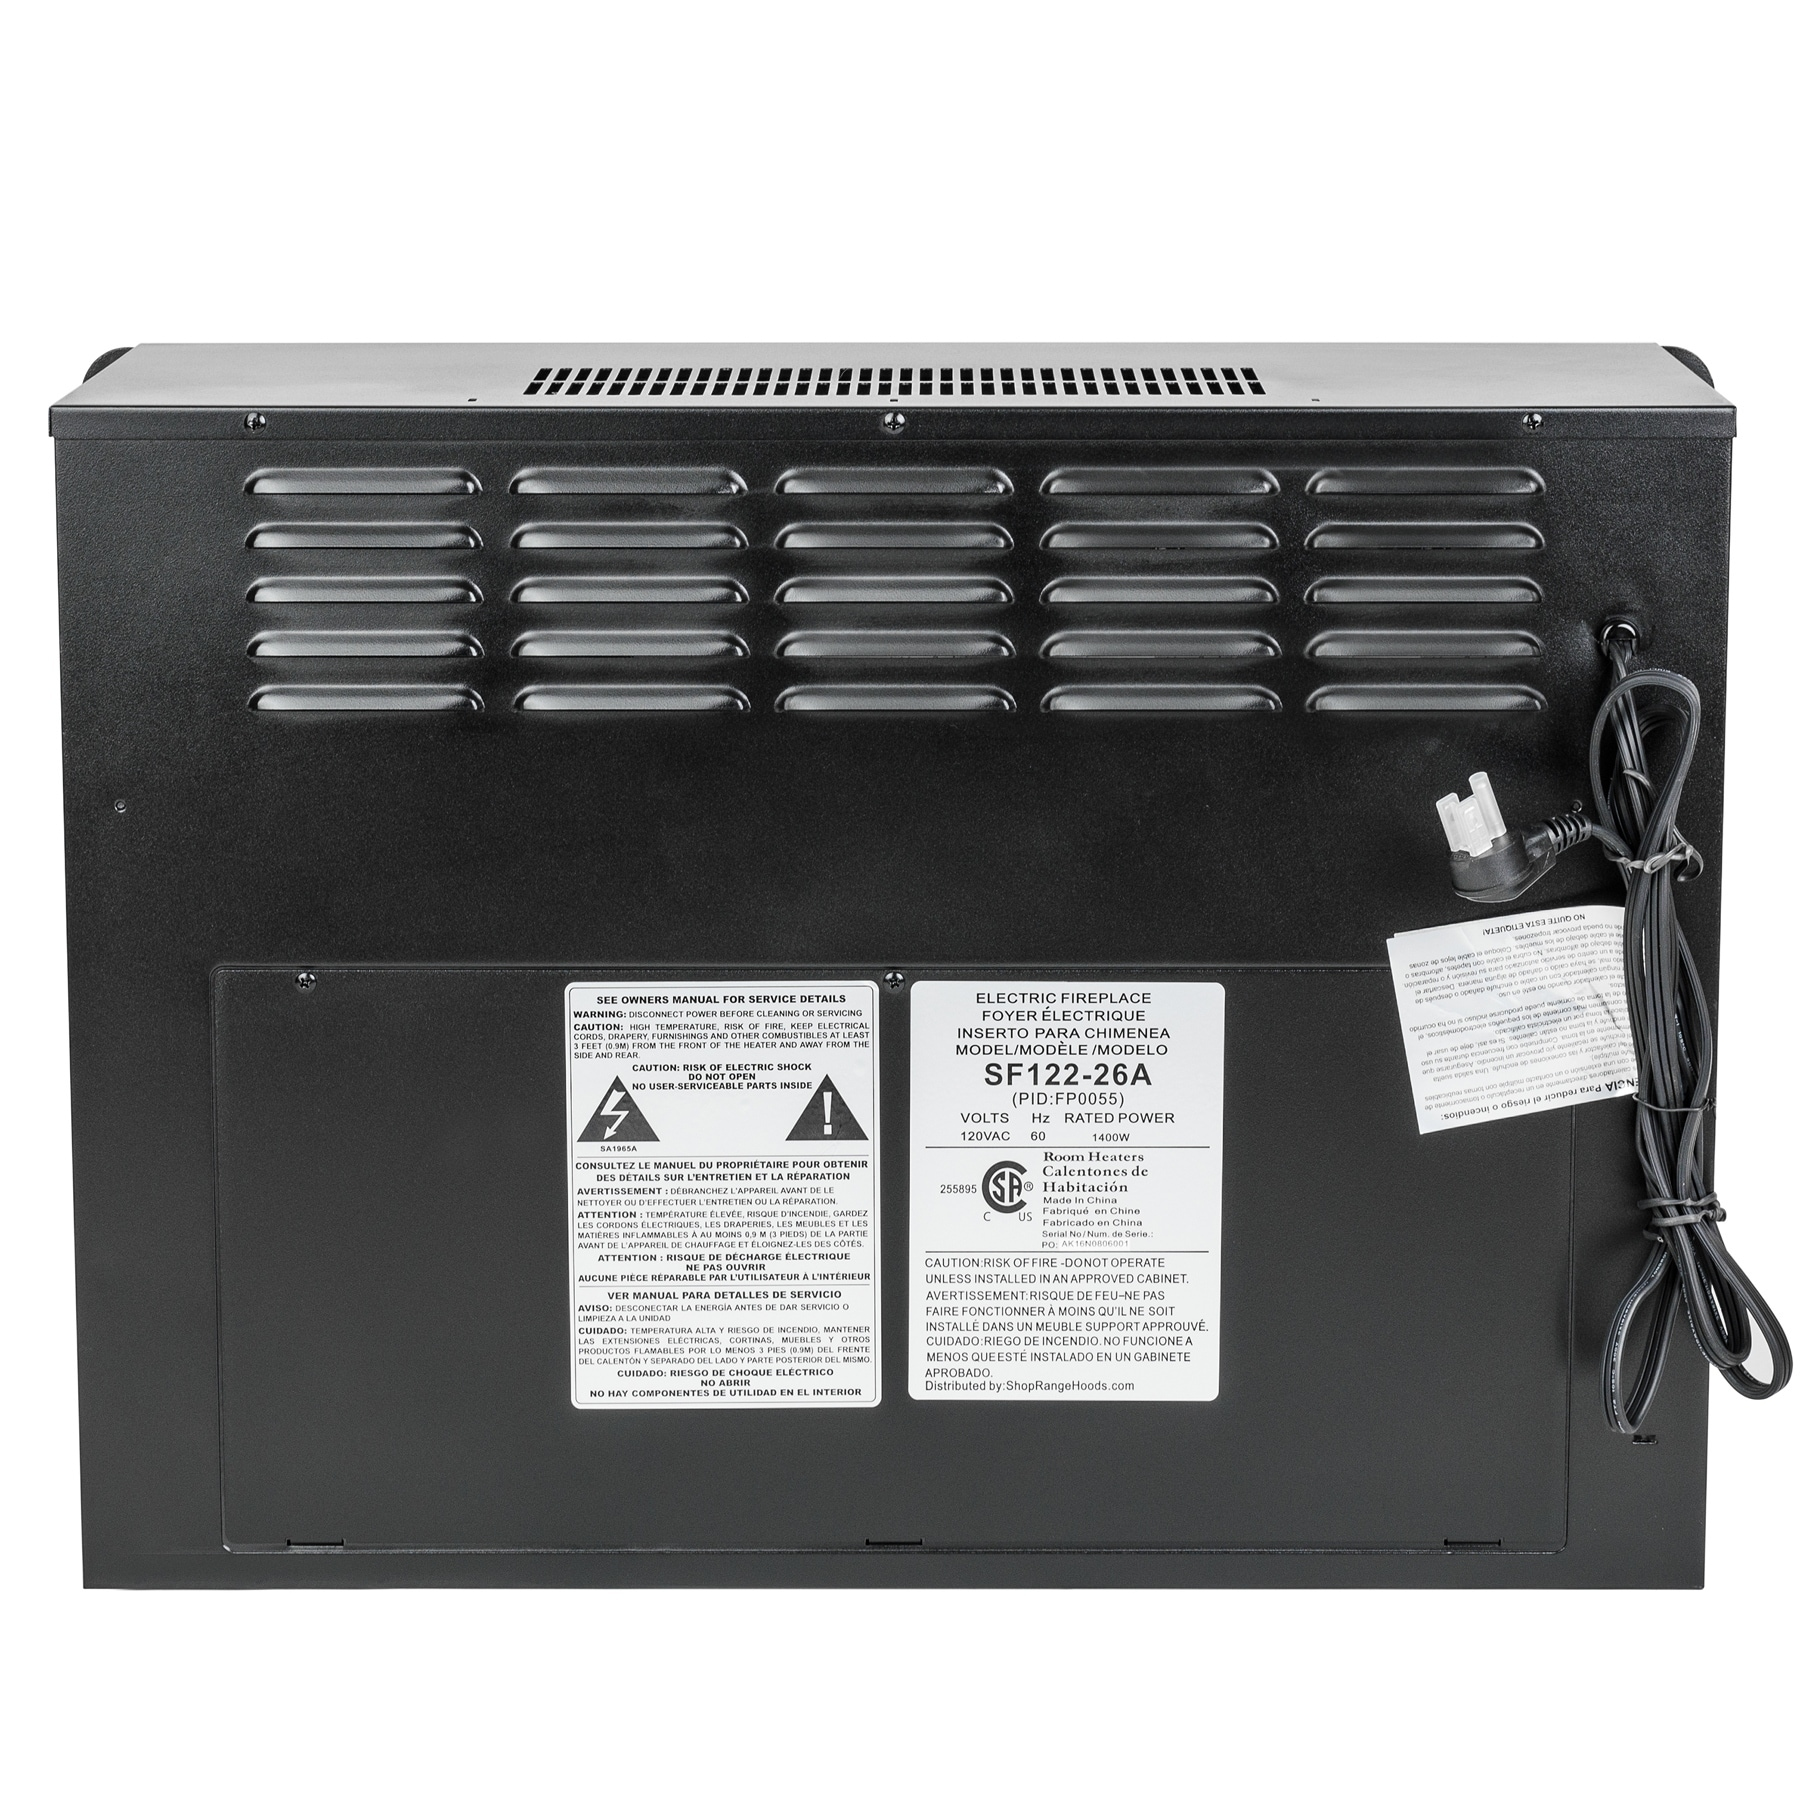 Akdy 23 Black Freestanding Electric Firebox Fireplace Heater Insert With